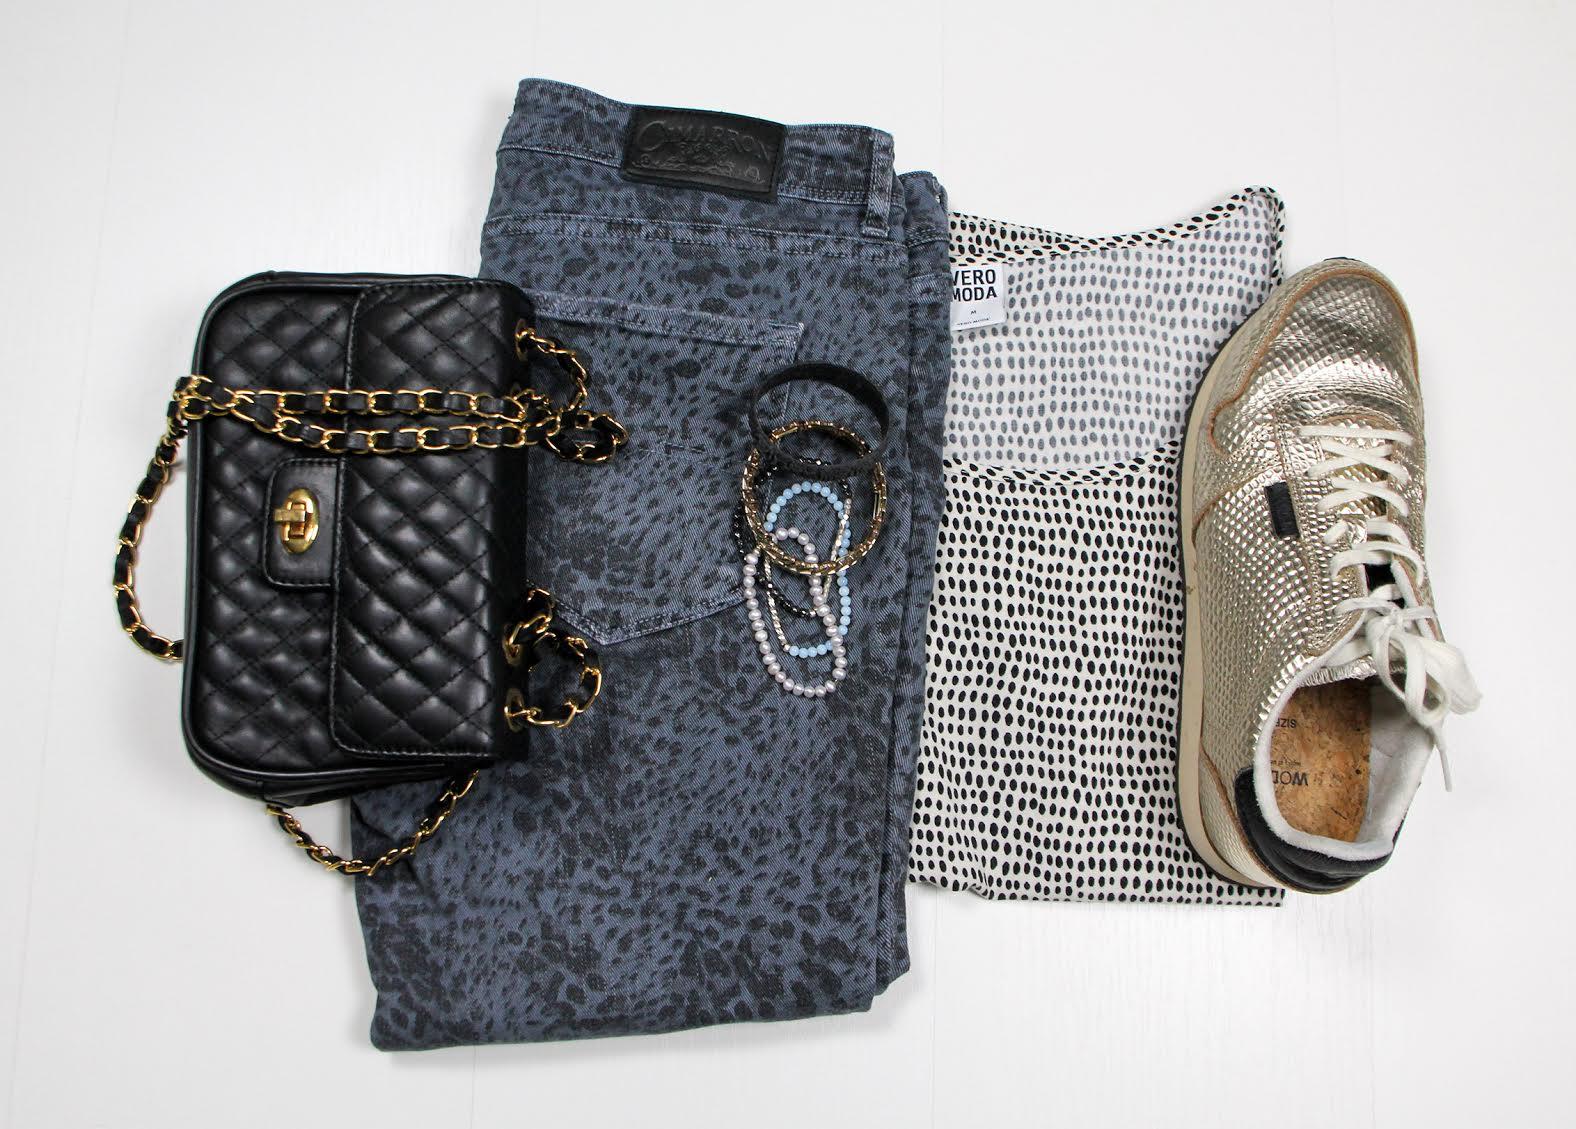 parisienne stijladvies combineren kleding utrecht stijladvies kledingadvies